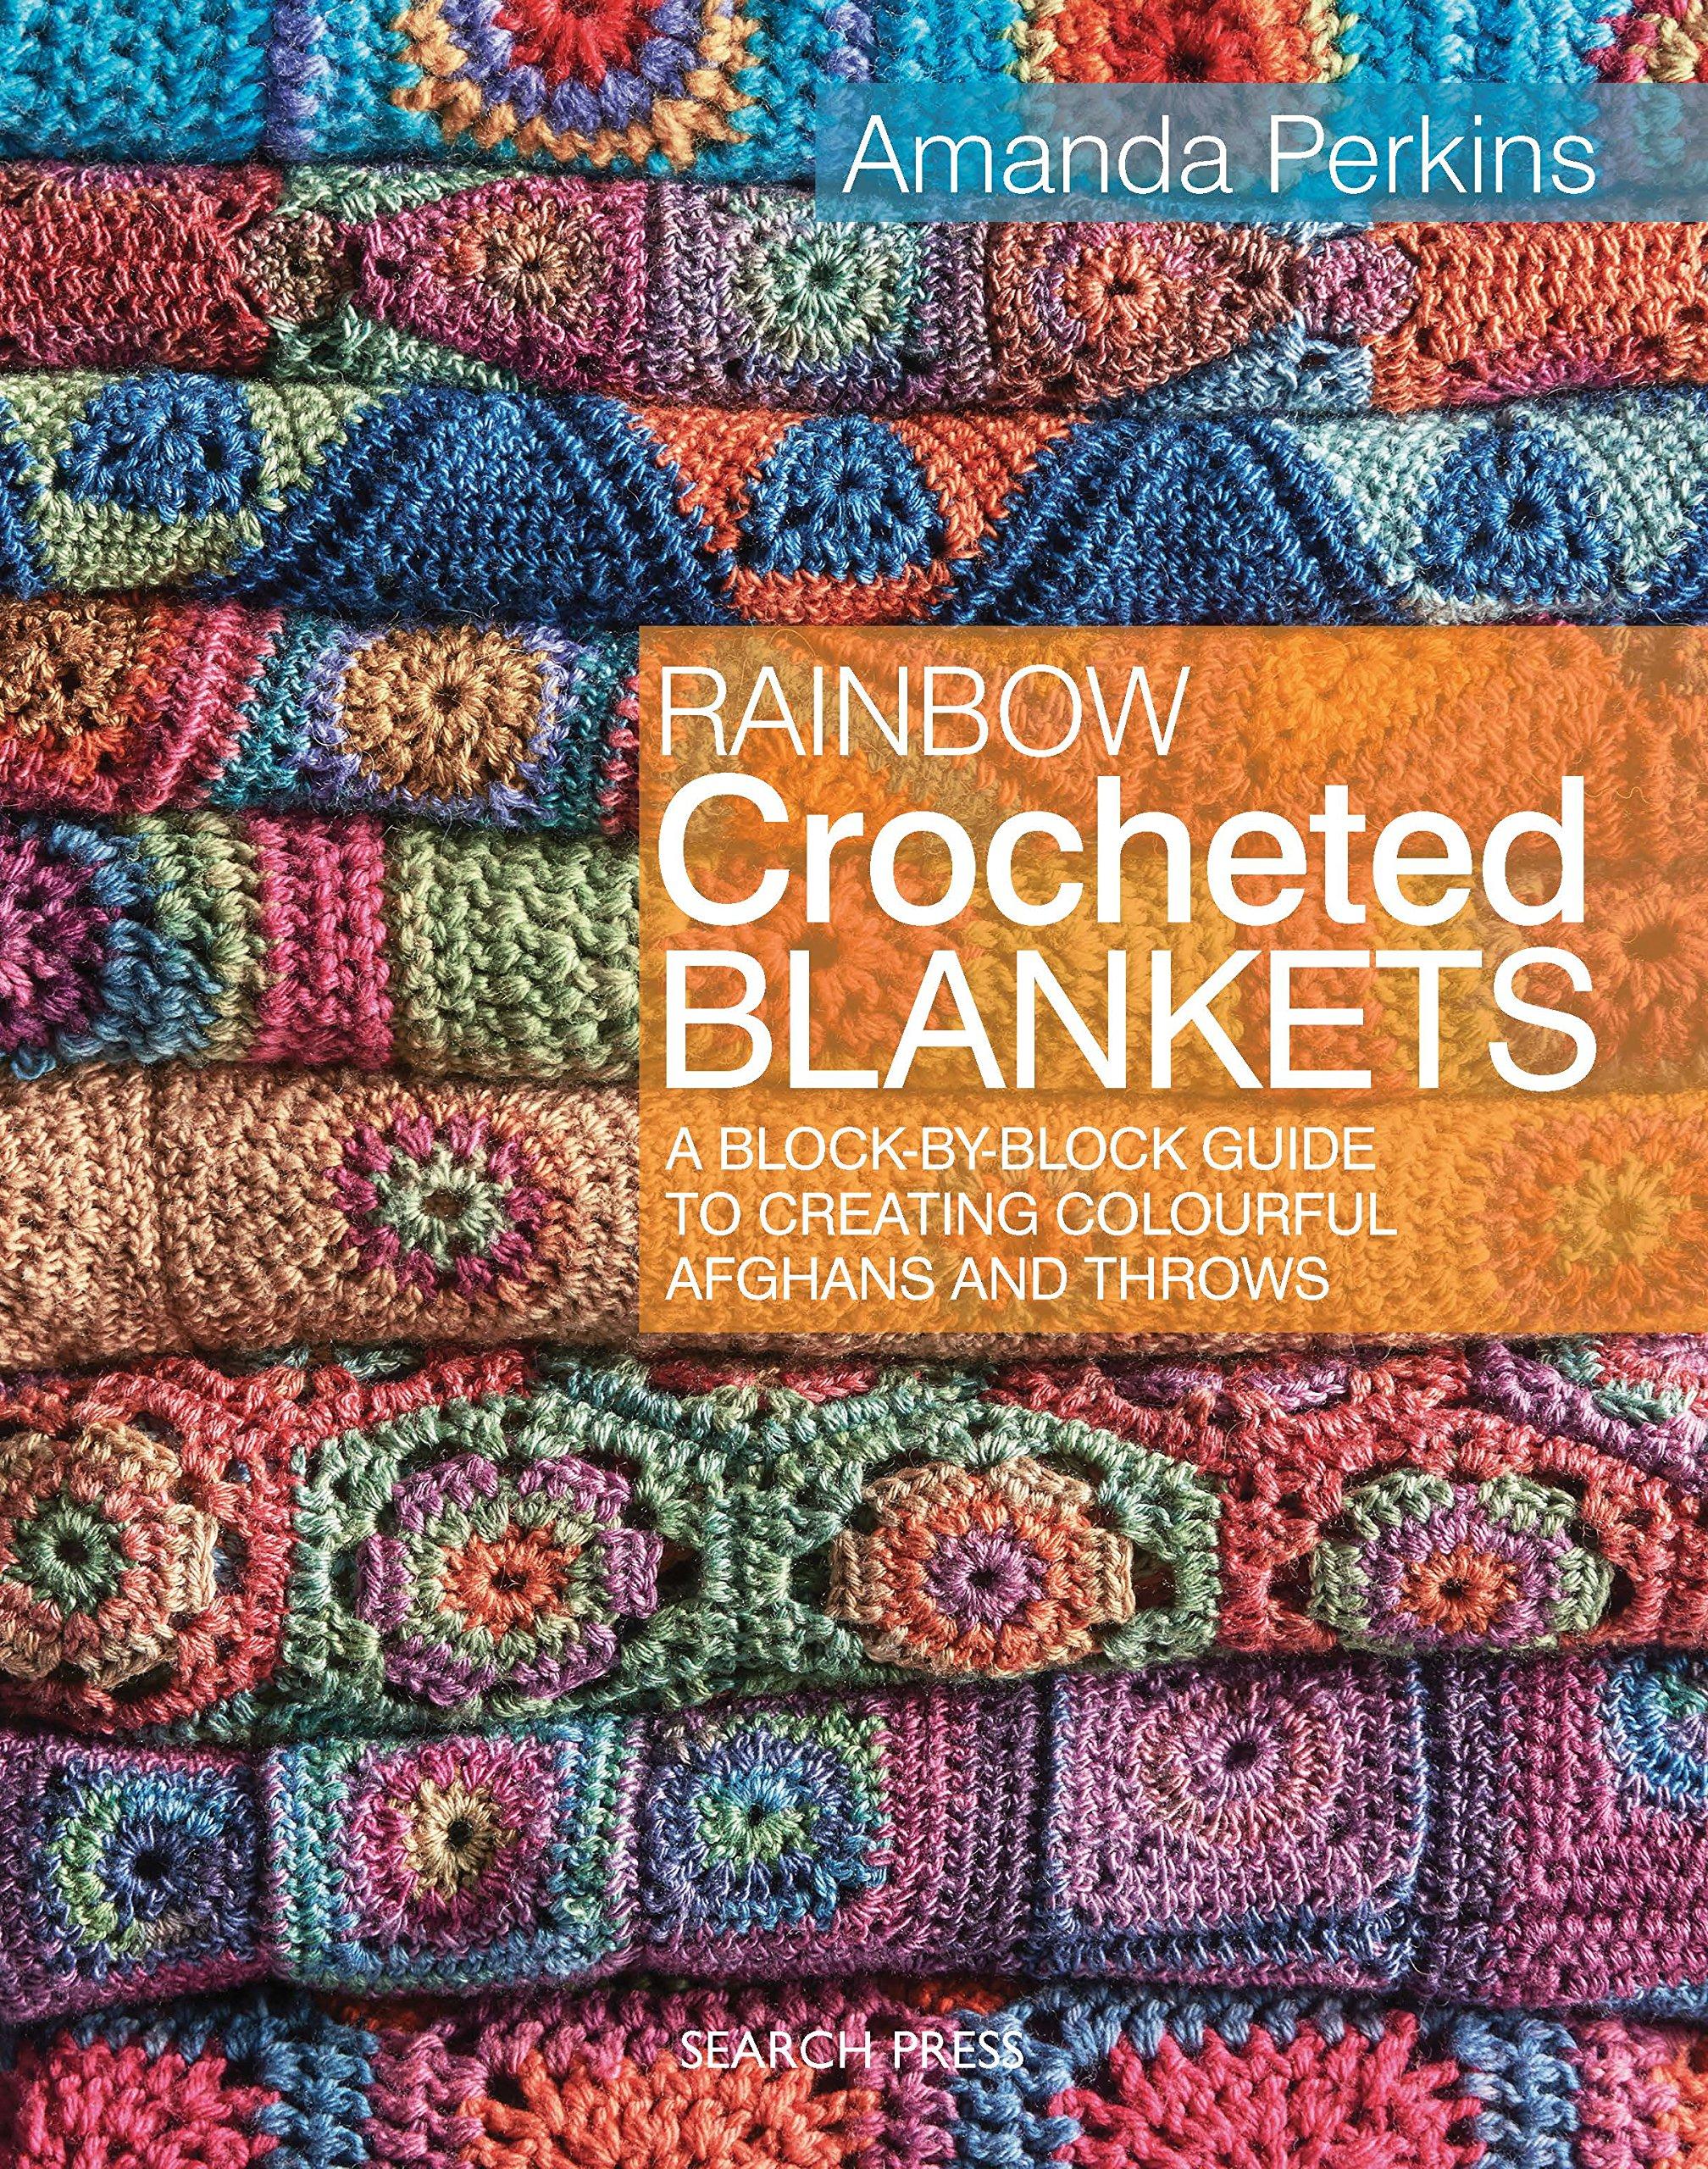 Sea turtle crochet bag pattern sea turtle gifts beach lovers | Etsy | 2560x2016